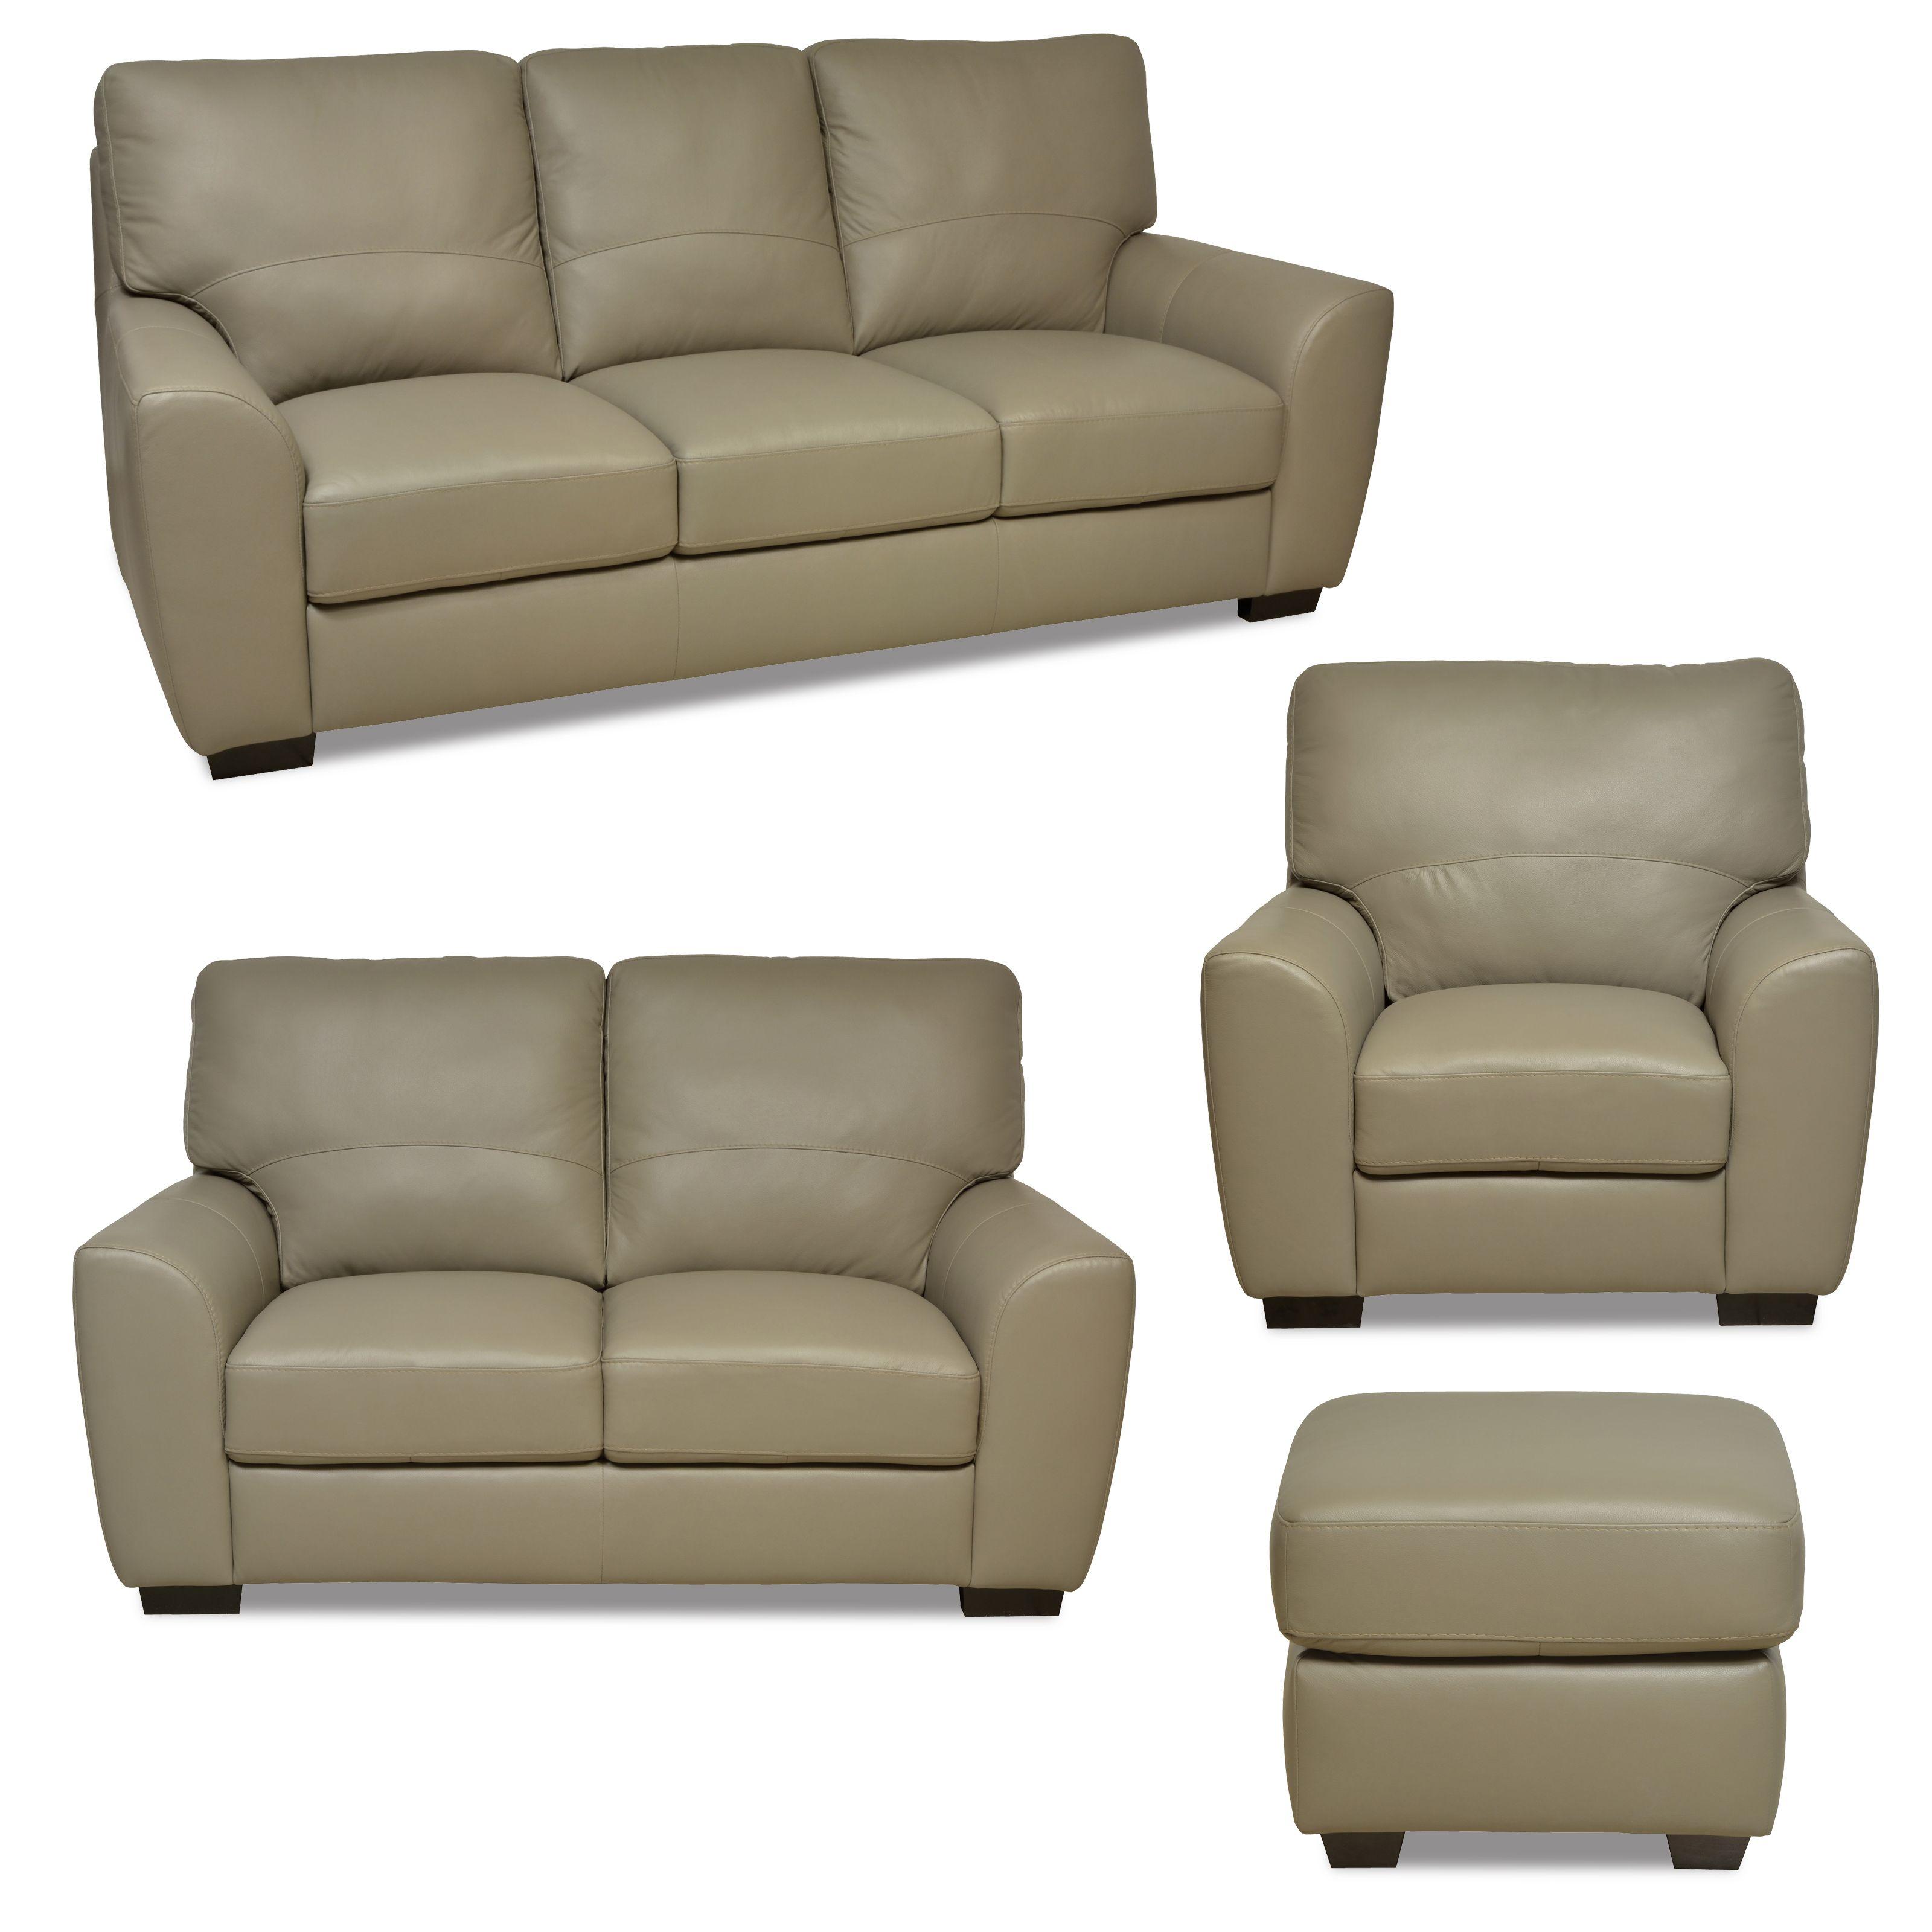 100 real leather corner sofa custom design india sofas dwight designs home and